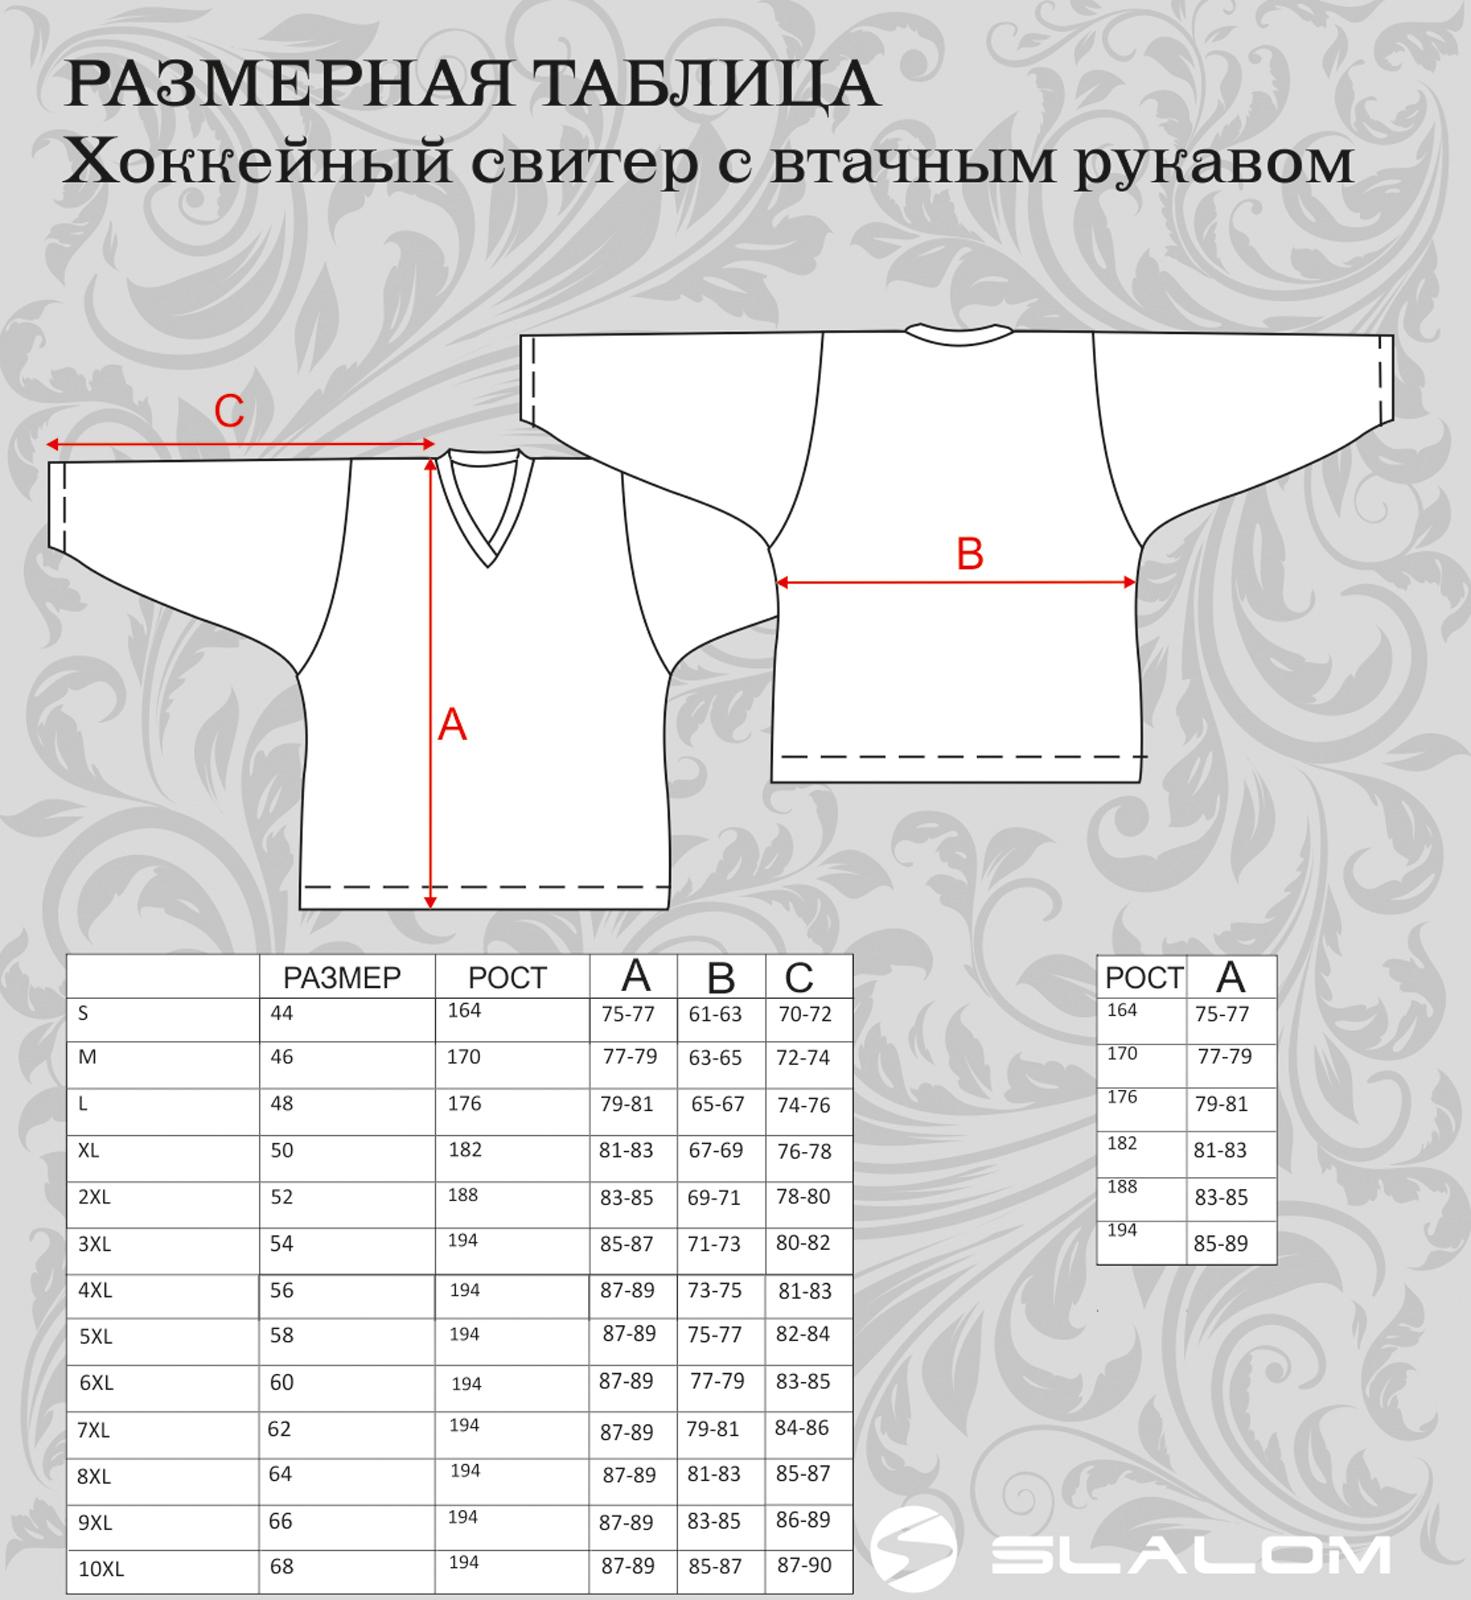 rs_hokswit_vtachnoi